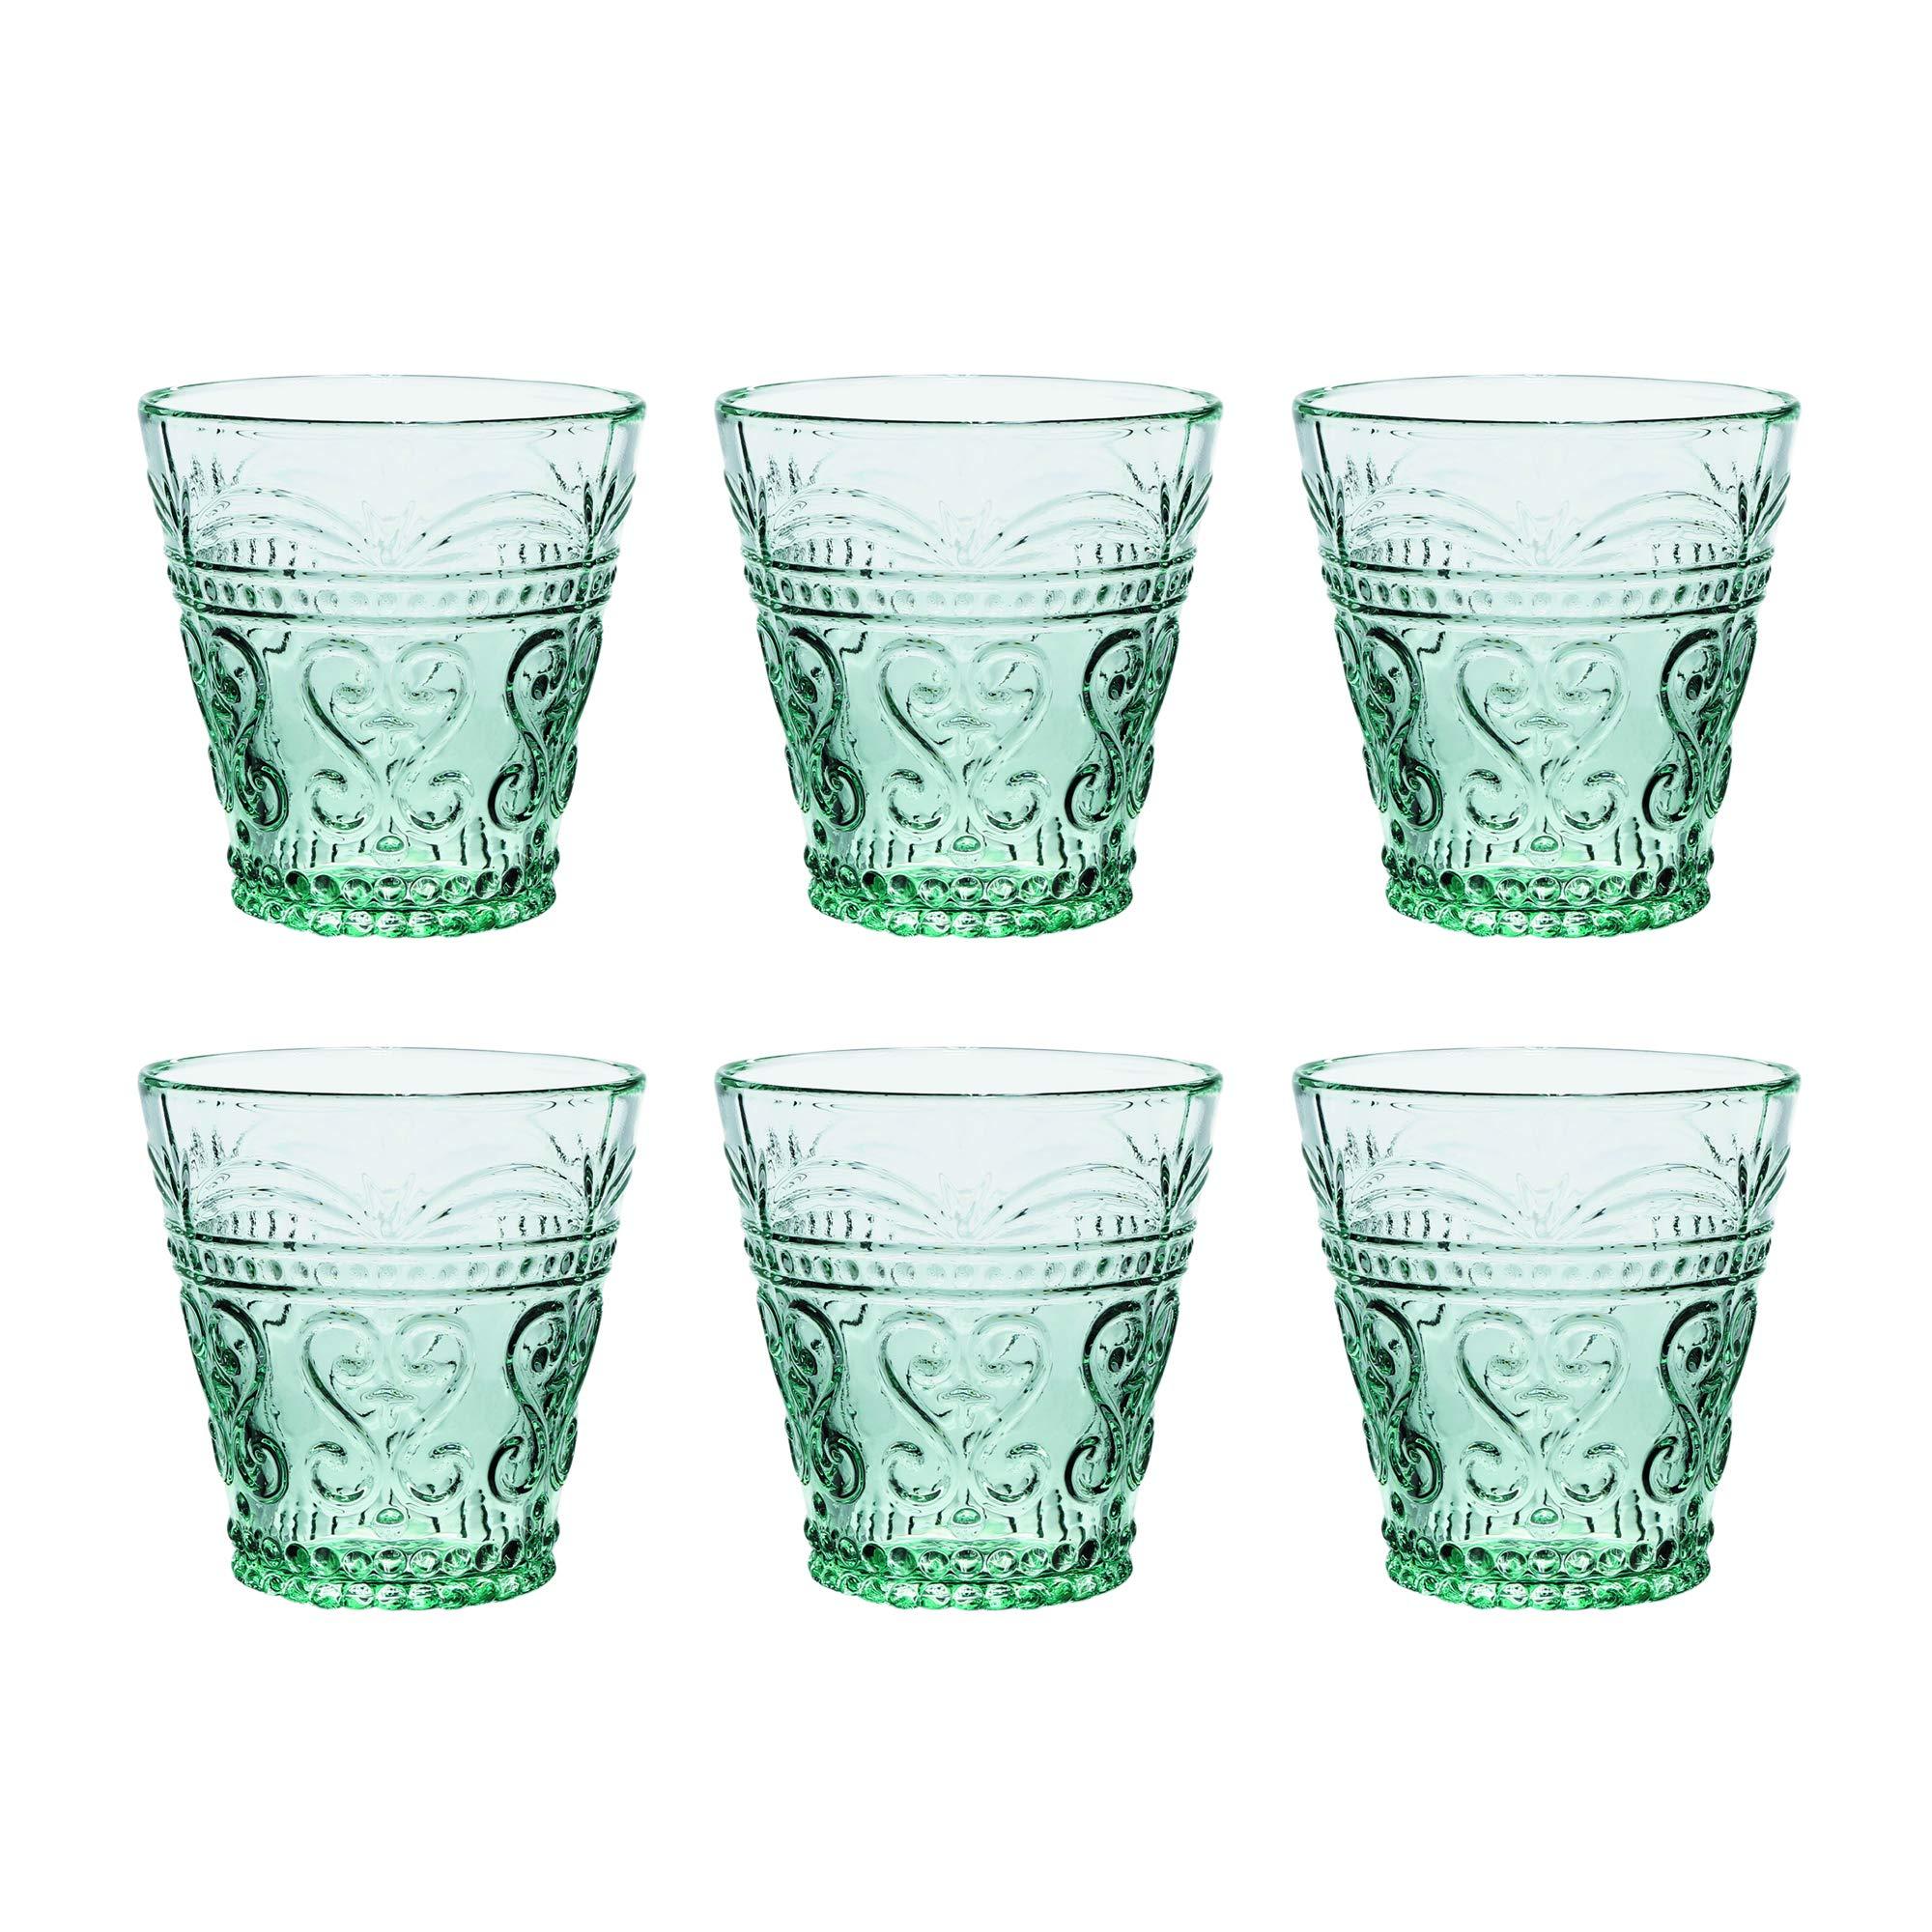 Kom Amsterdam 6AQM1 Aqua Waterglass, Soda Lime Glass, 240 milliliters, Green by Kom Amsterdam (Image #1)